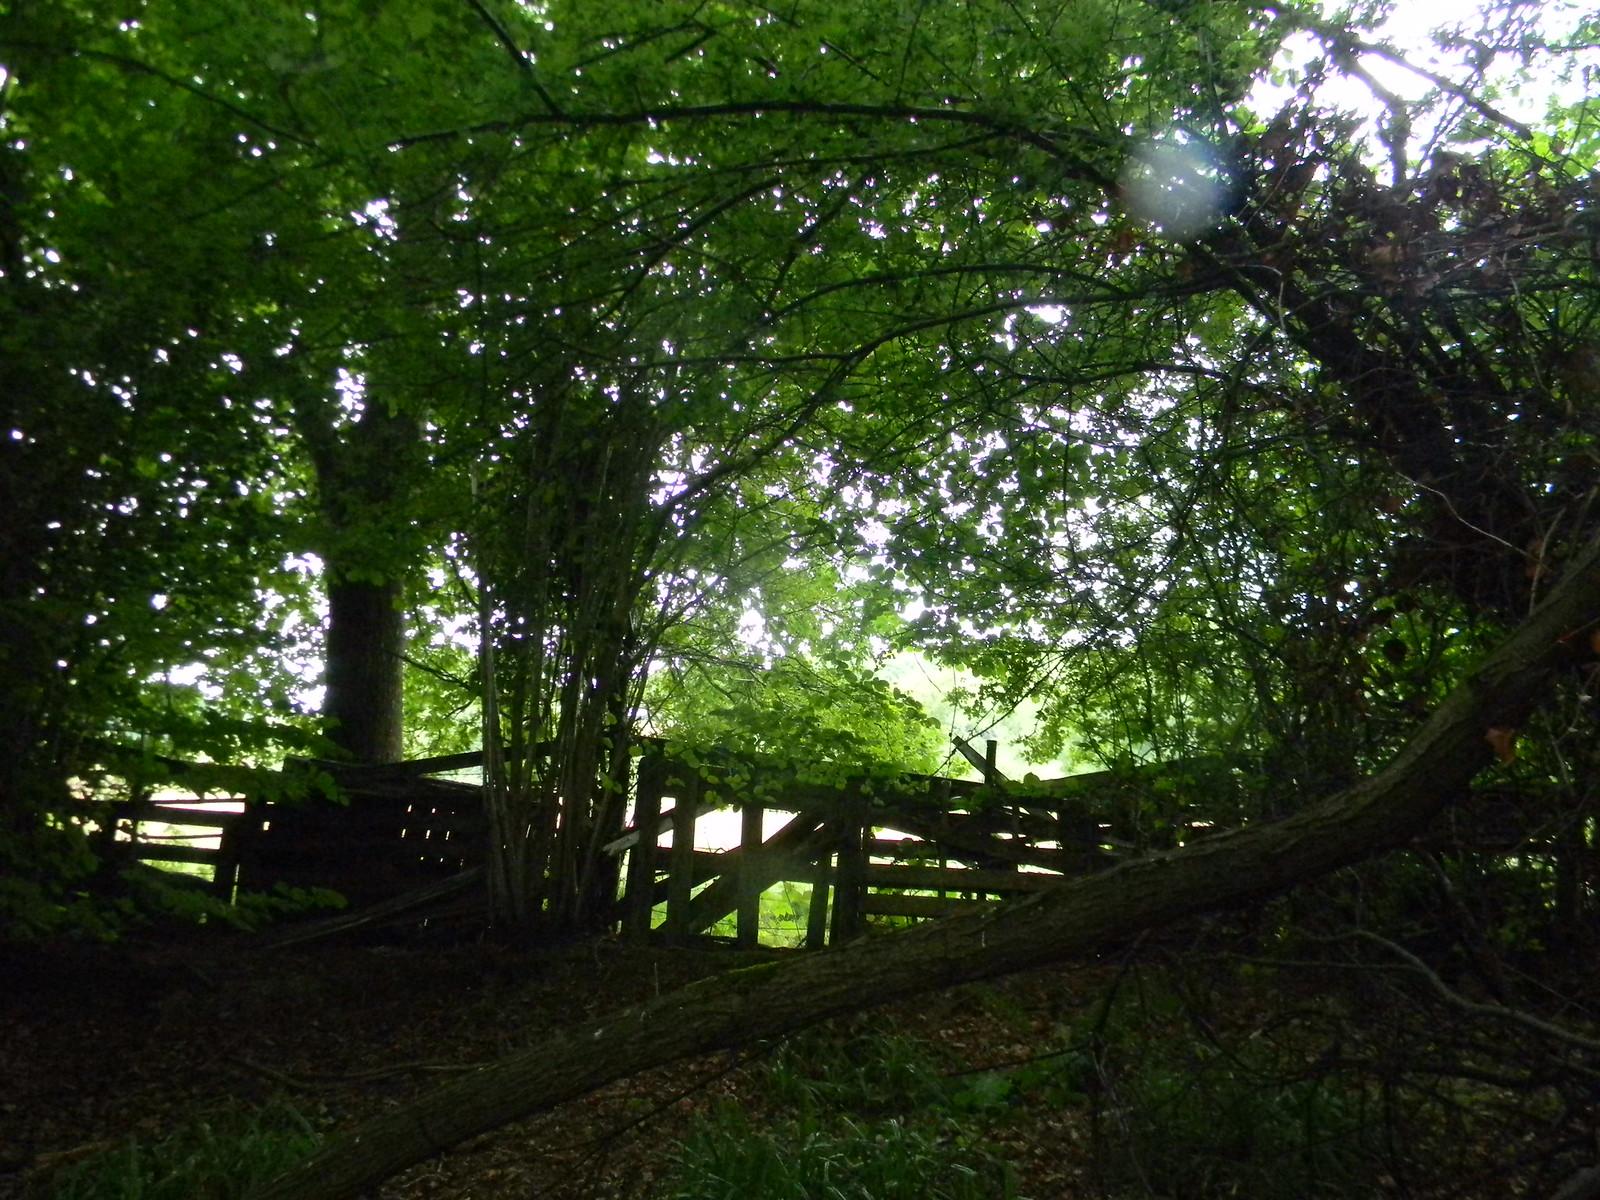 Ramshackle fence 1 Wadhurst Circular